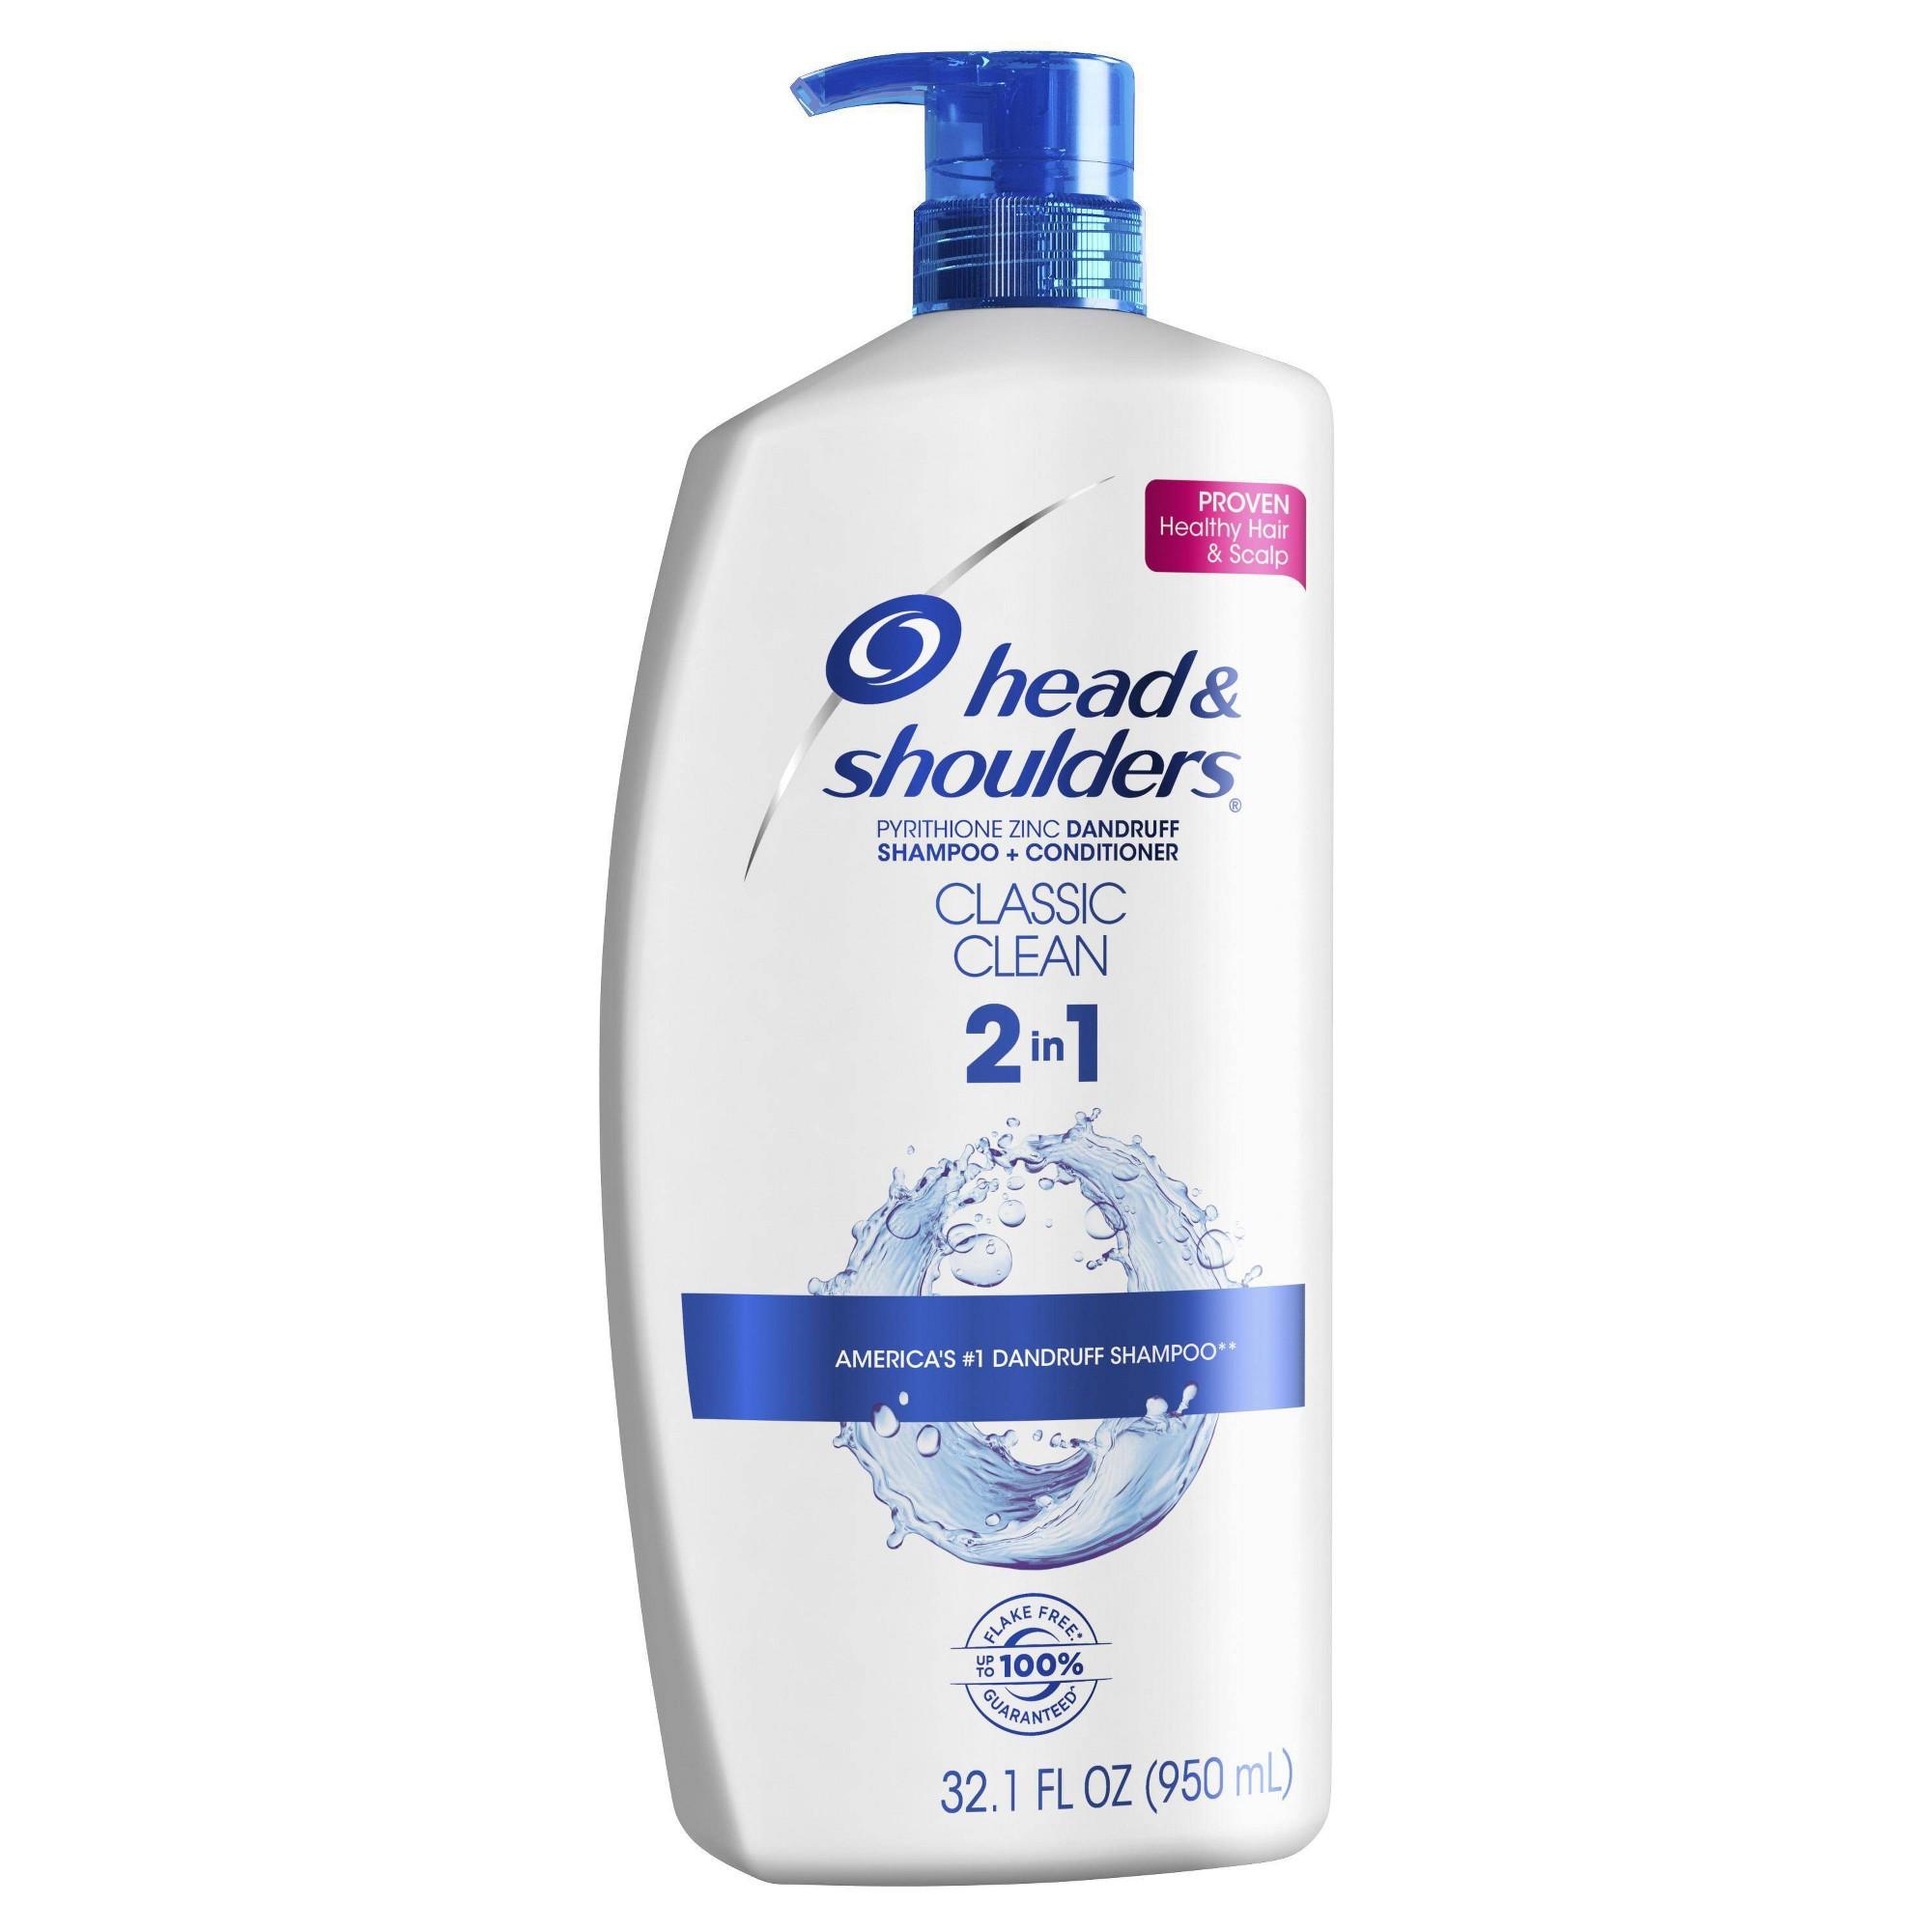 Head & Shoulders 2-in-1 Classic Clean Shampoo - 32.1 fl oz, Size: 33.9fl oz